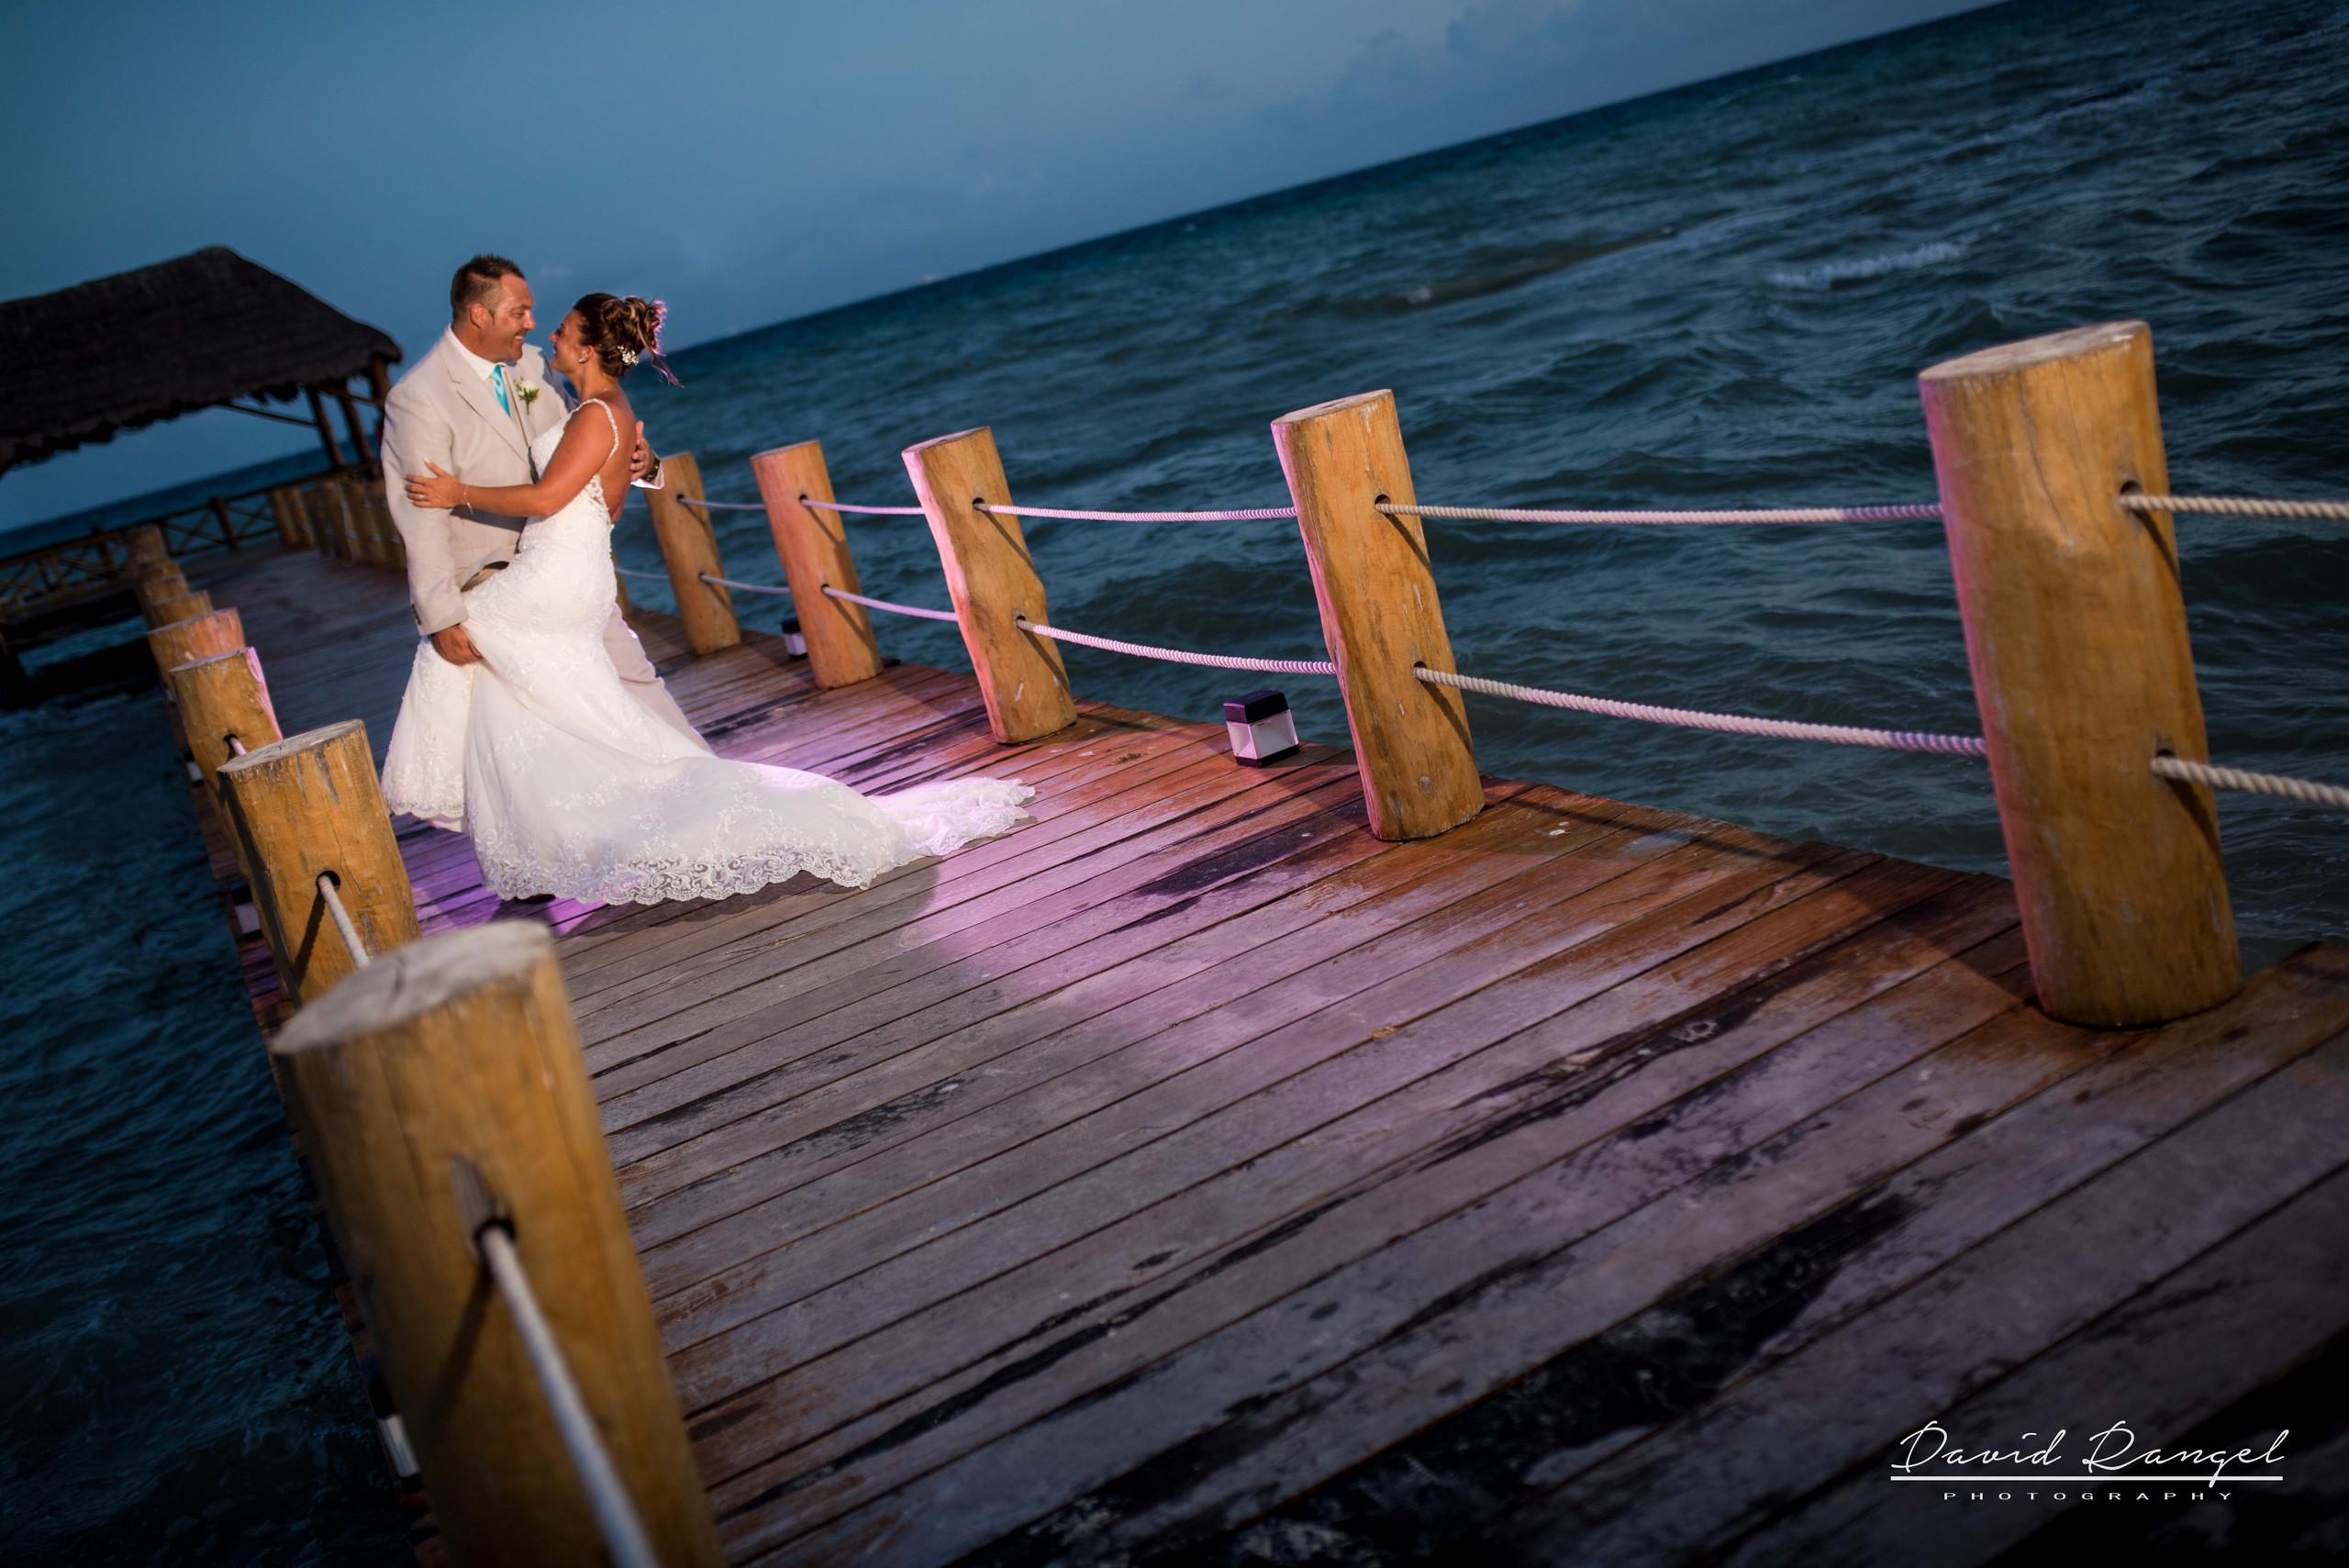 wedding+couple+pier+beach+photo+backlight